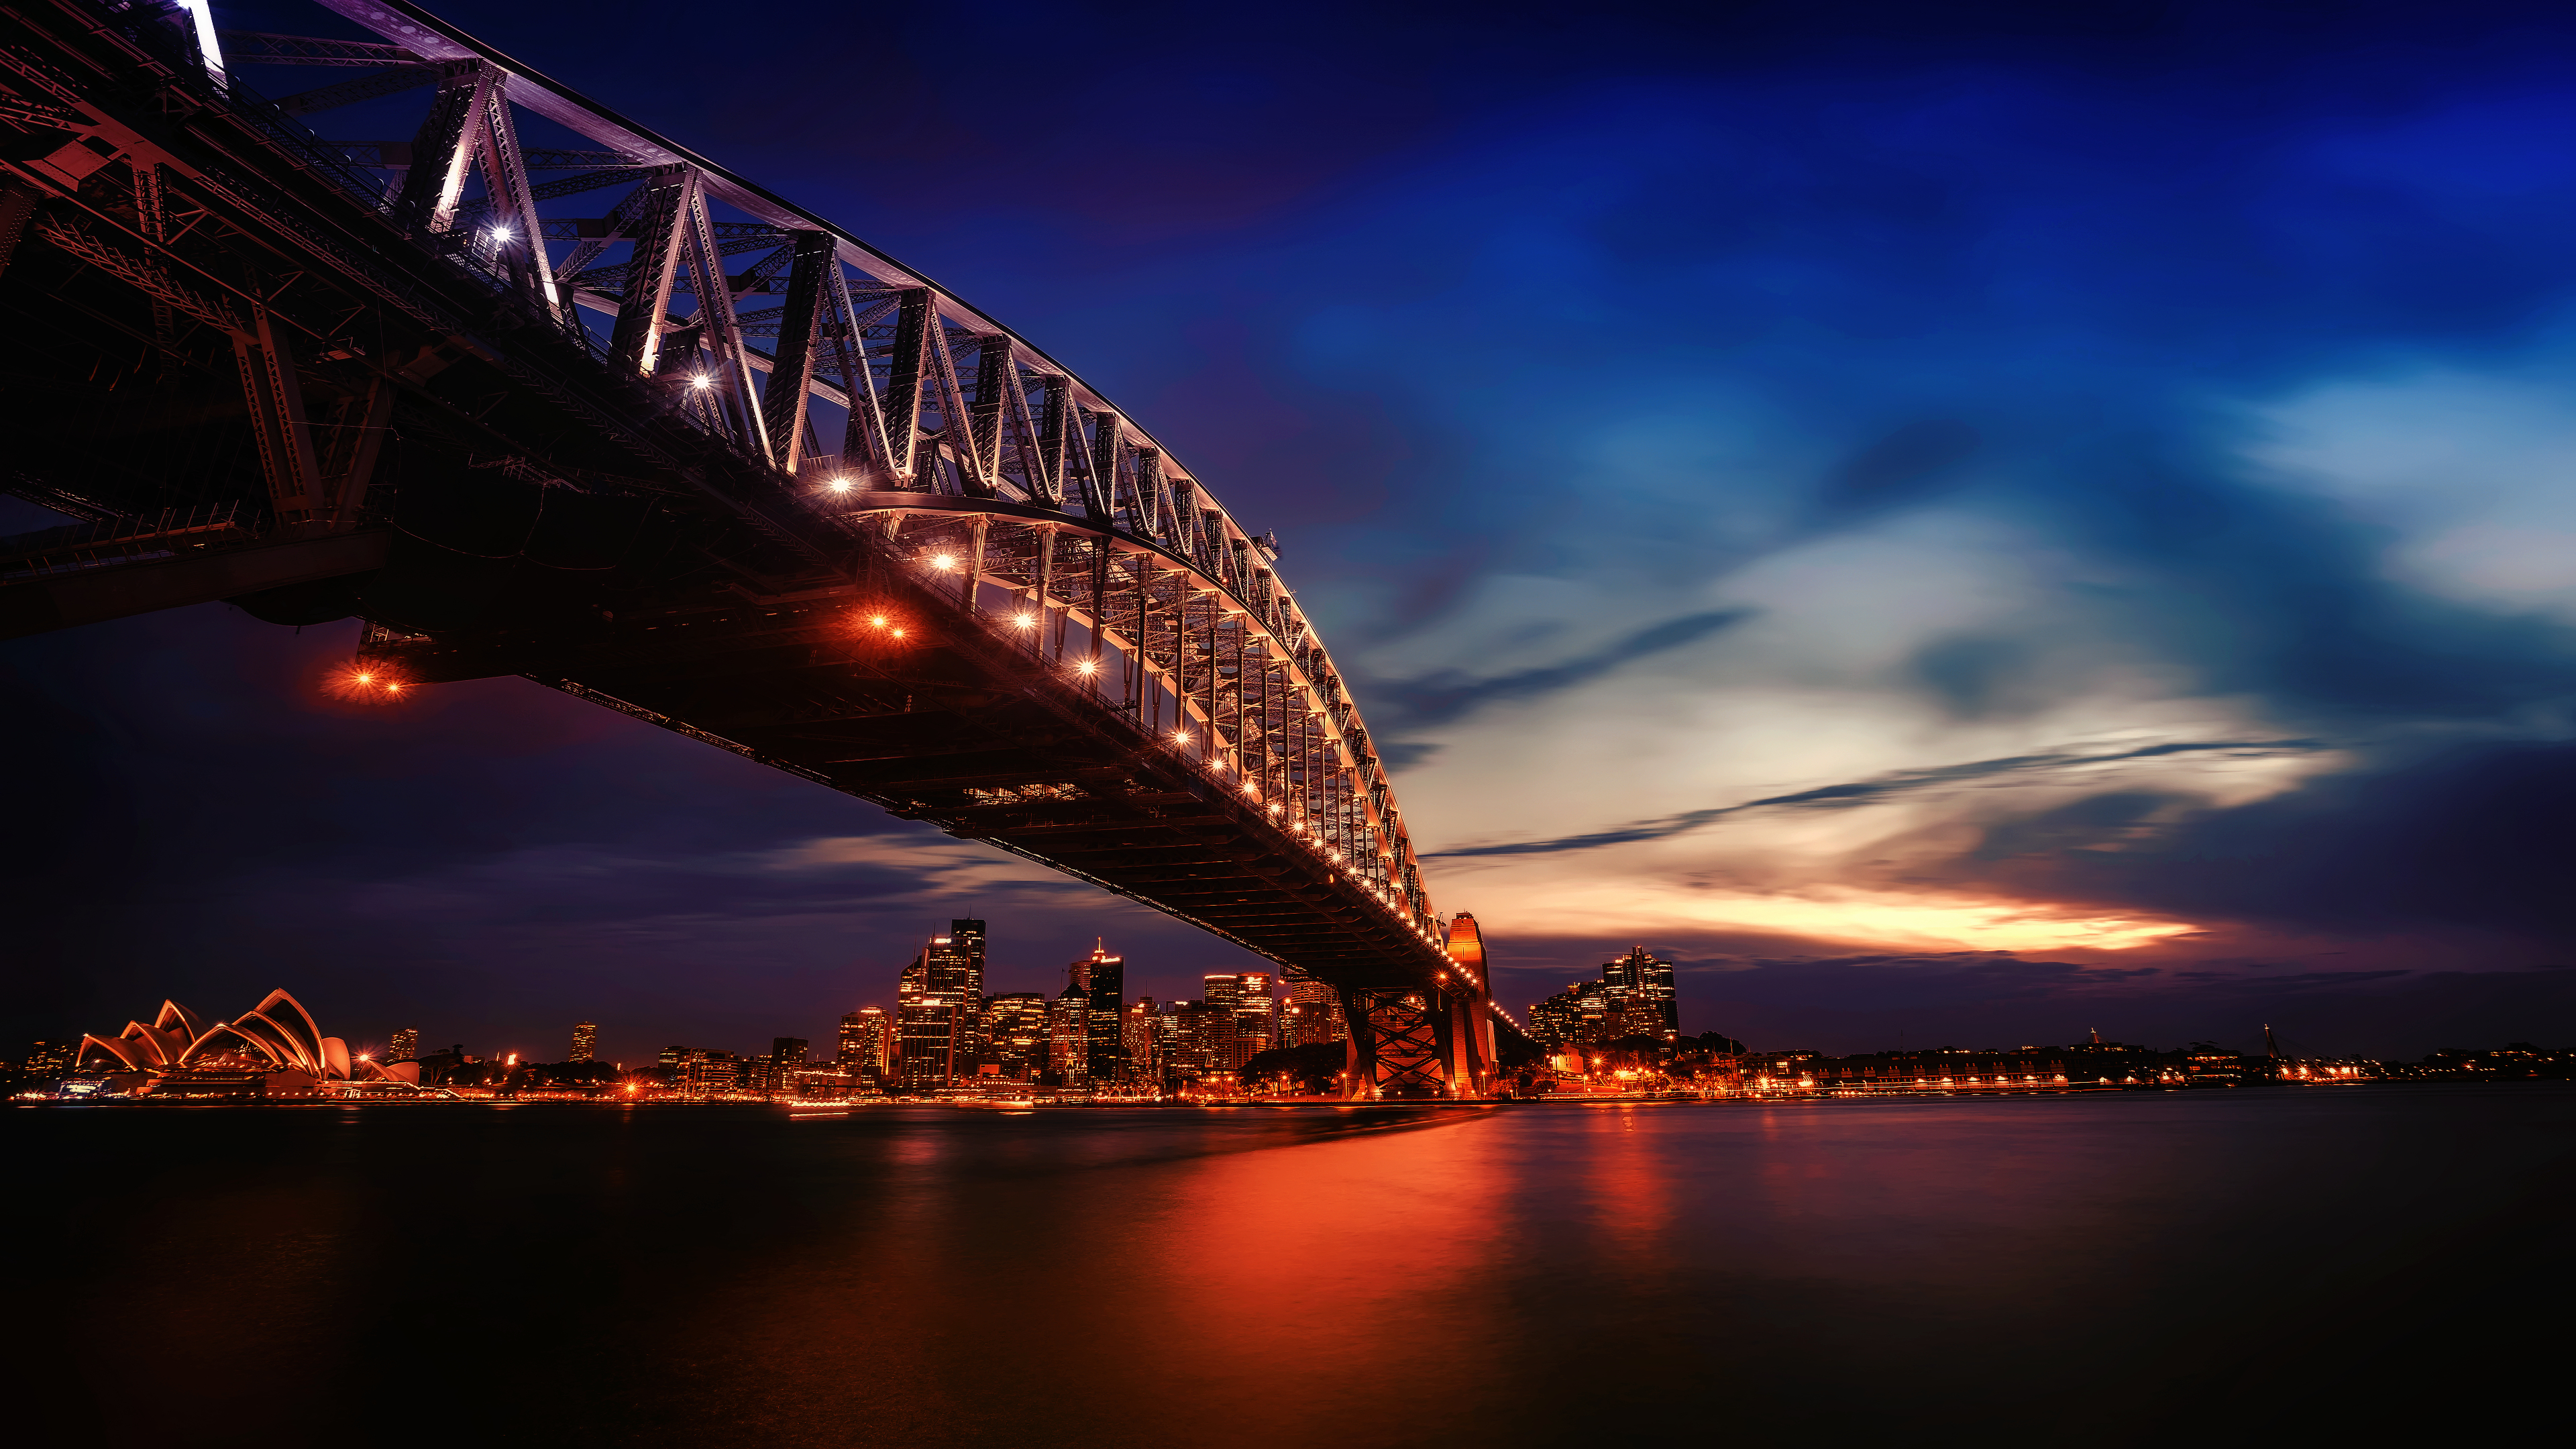 City Lights Sydney Harbour Bridge 4k, HD World, 4k ...